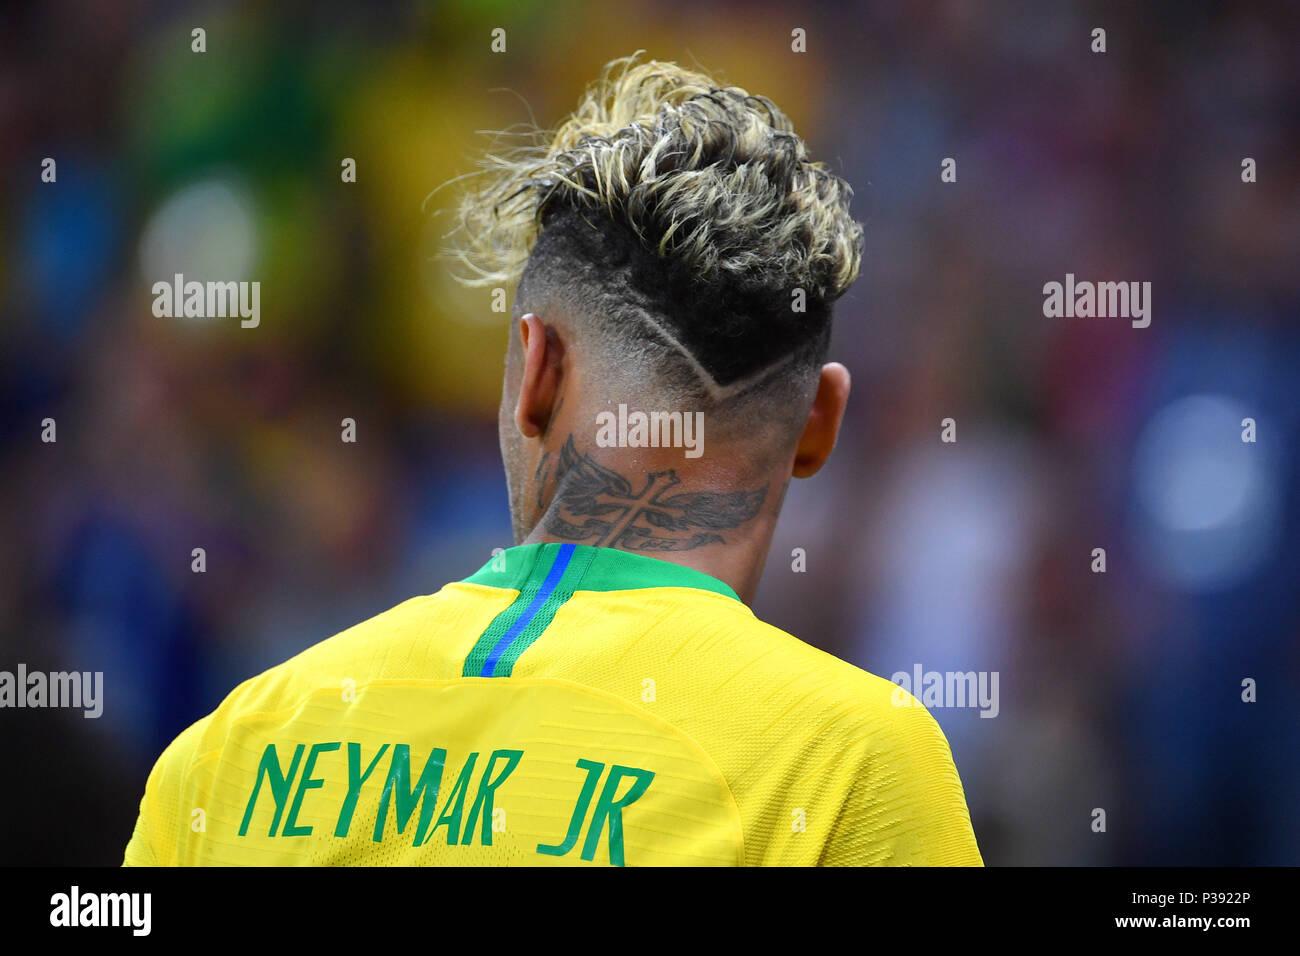 neymar (bra), rückseite des kopfes, frisur, aktion, single bild